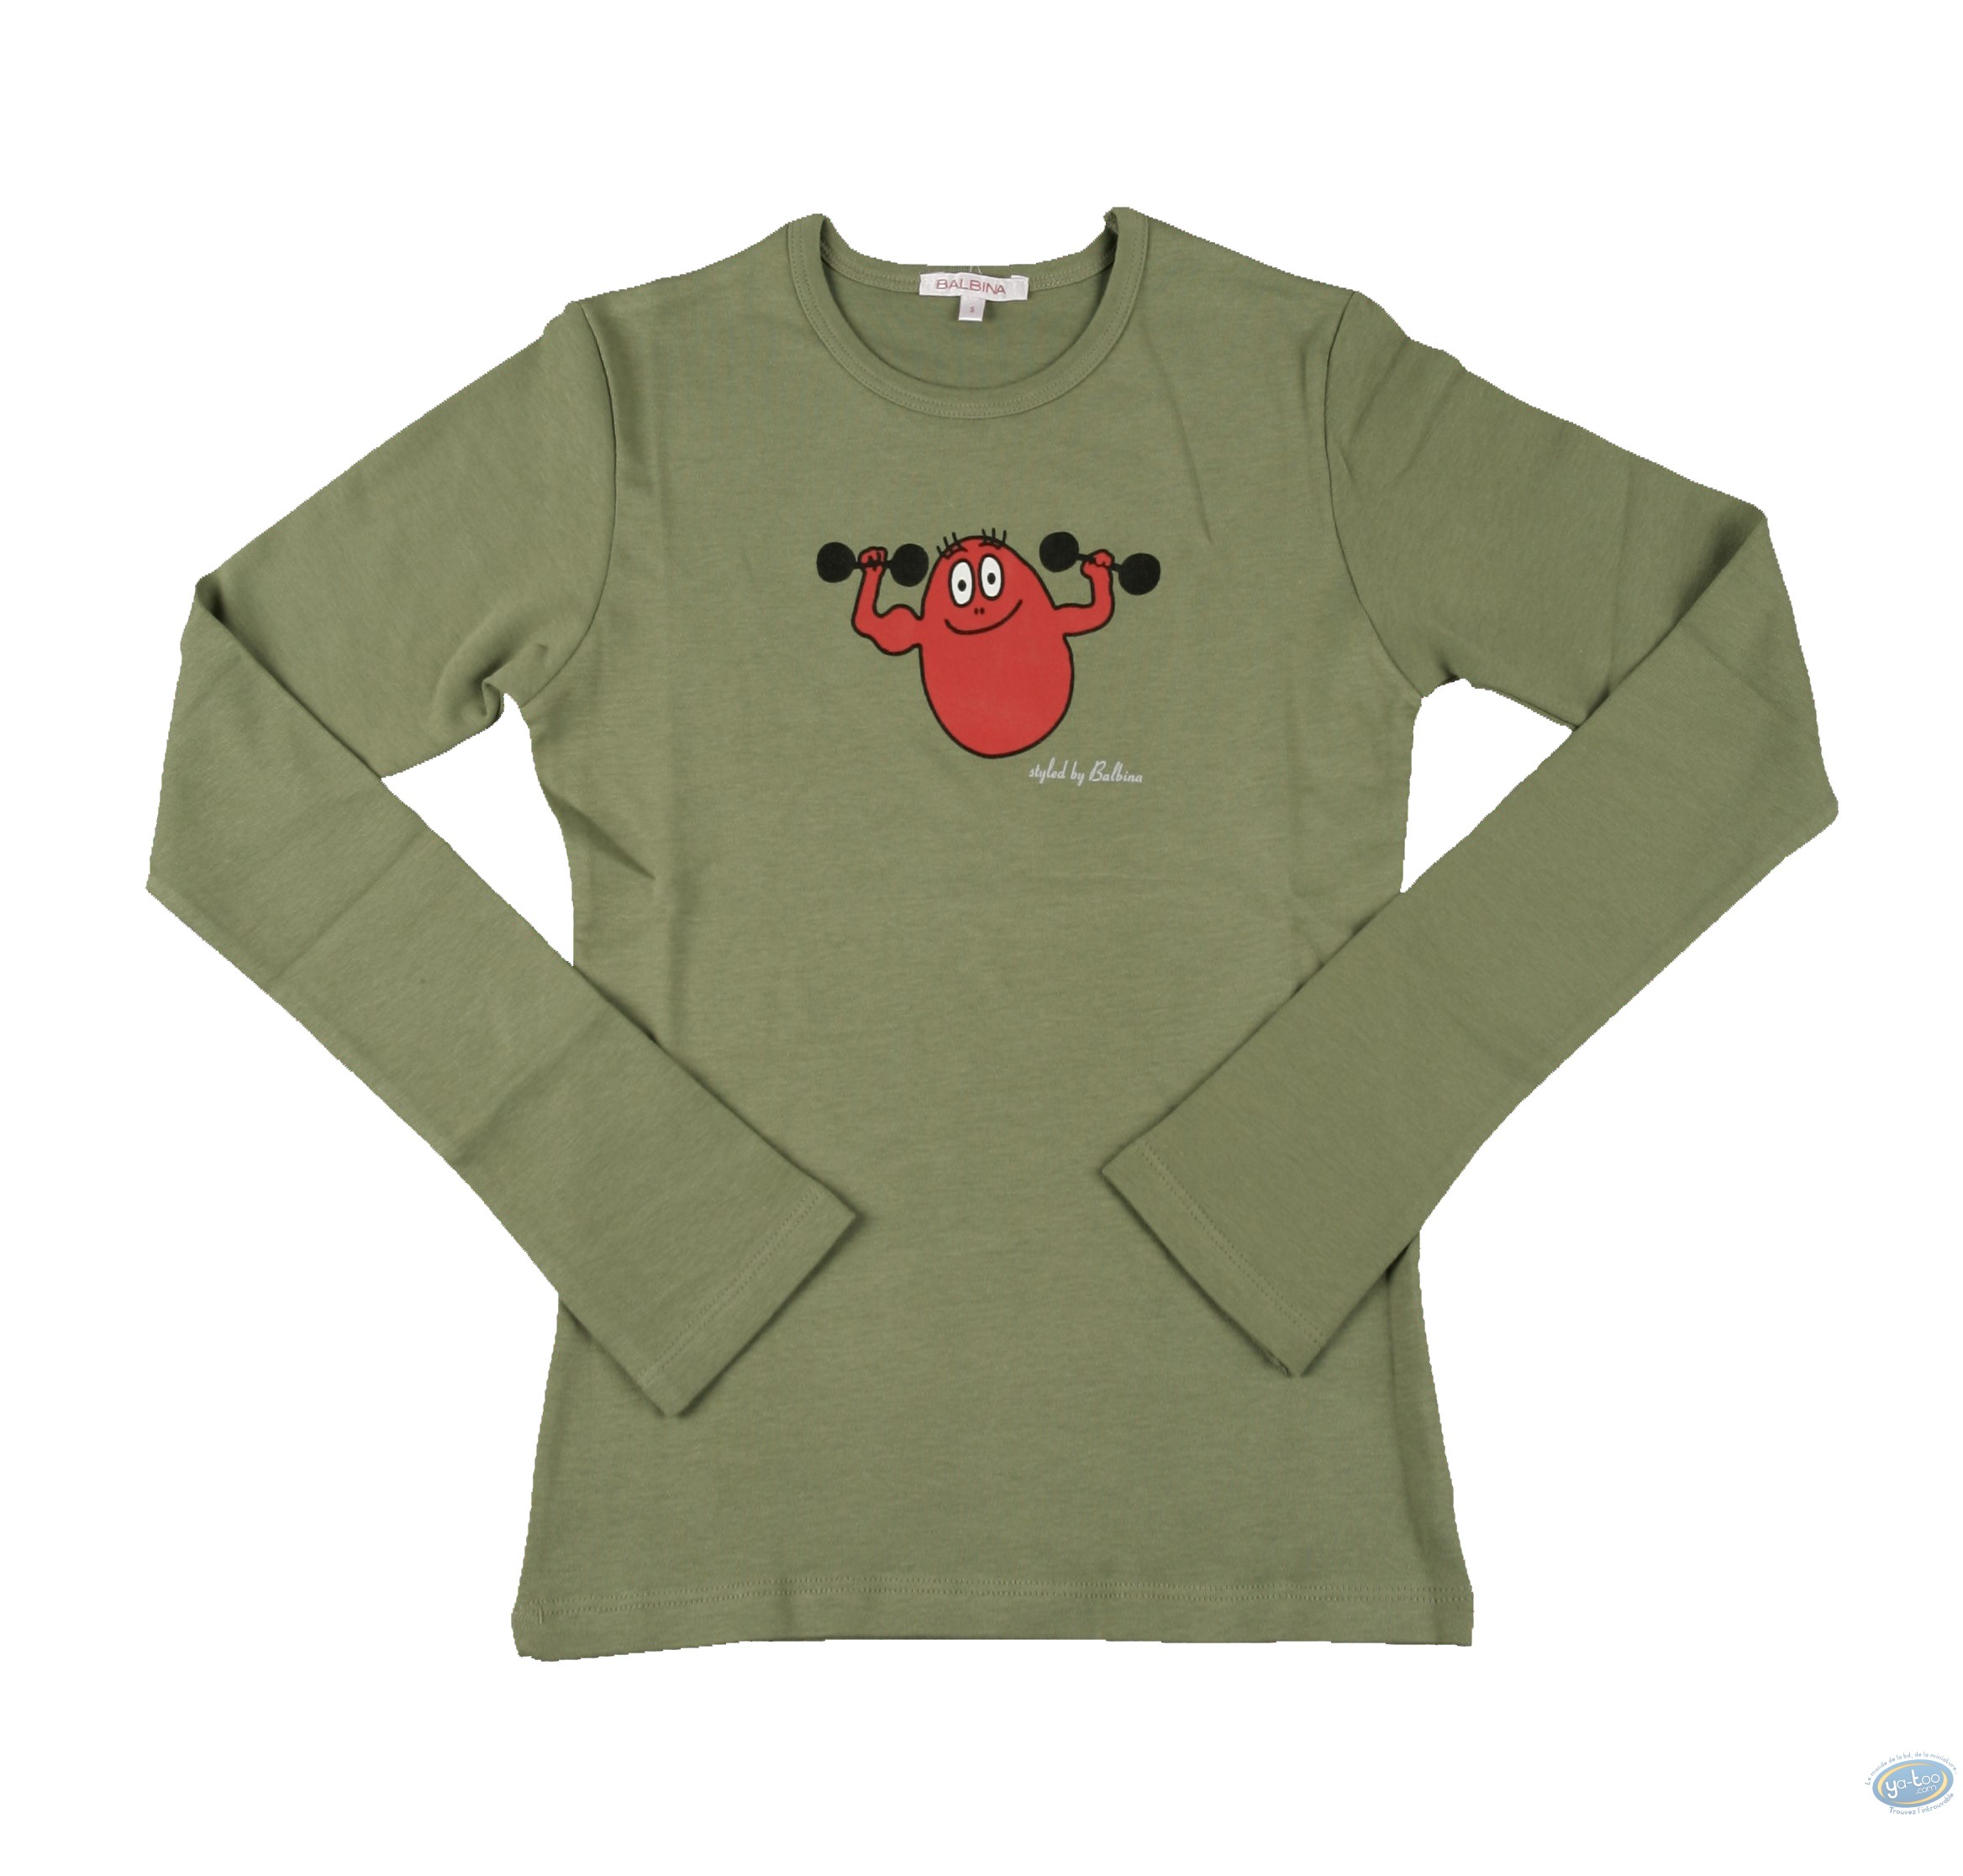 Vêtement, Barbapapa : T-shirt manches longues olive Barbapapa: taille L, haltères